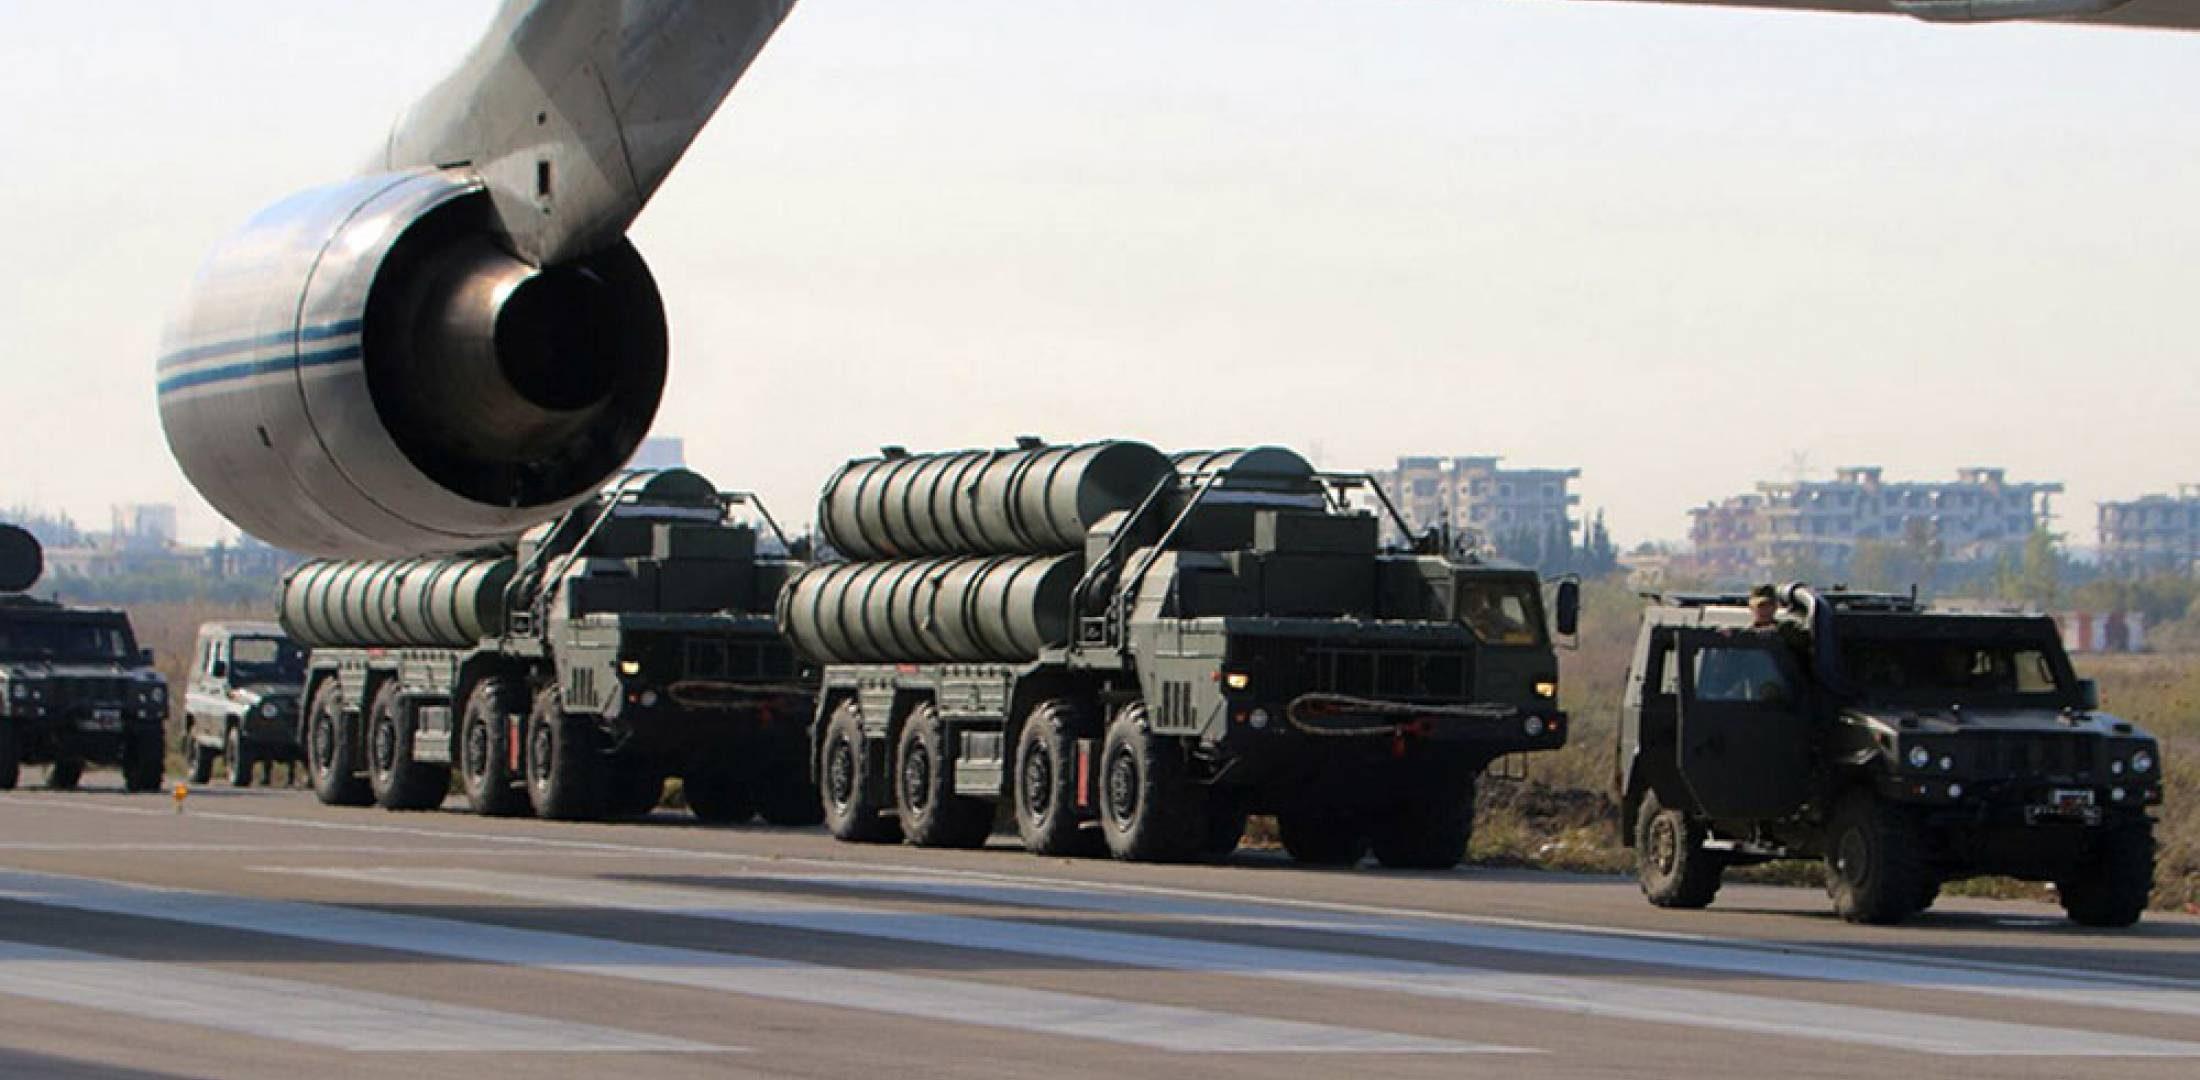 S-500: Το εξελιγμένο υπερόπλο της Ρωσίας που ξεπερνά κάθε σύστημα της Δύσης